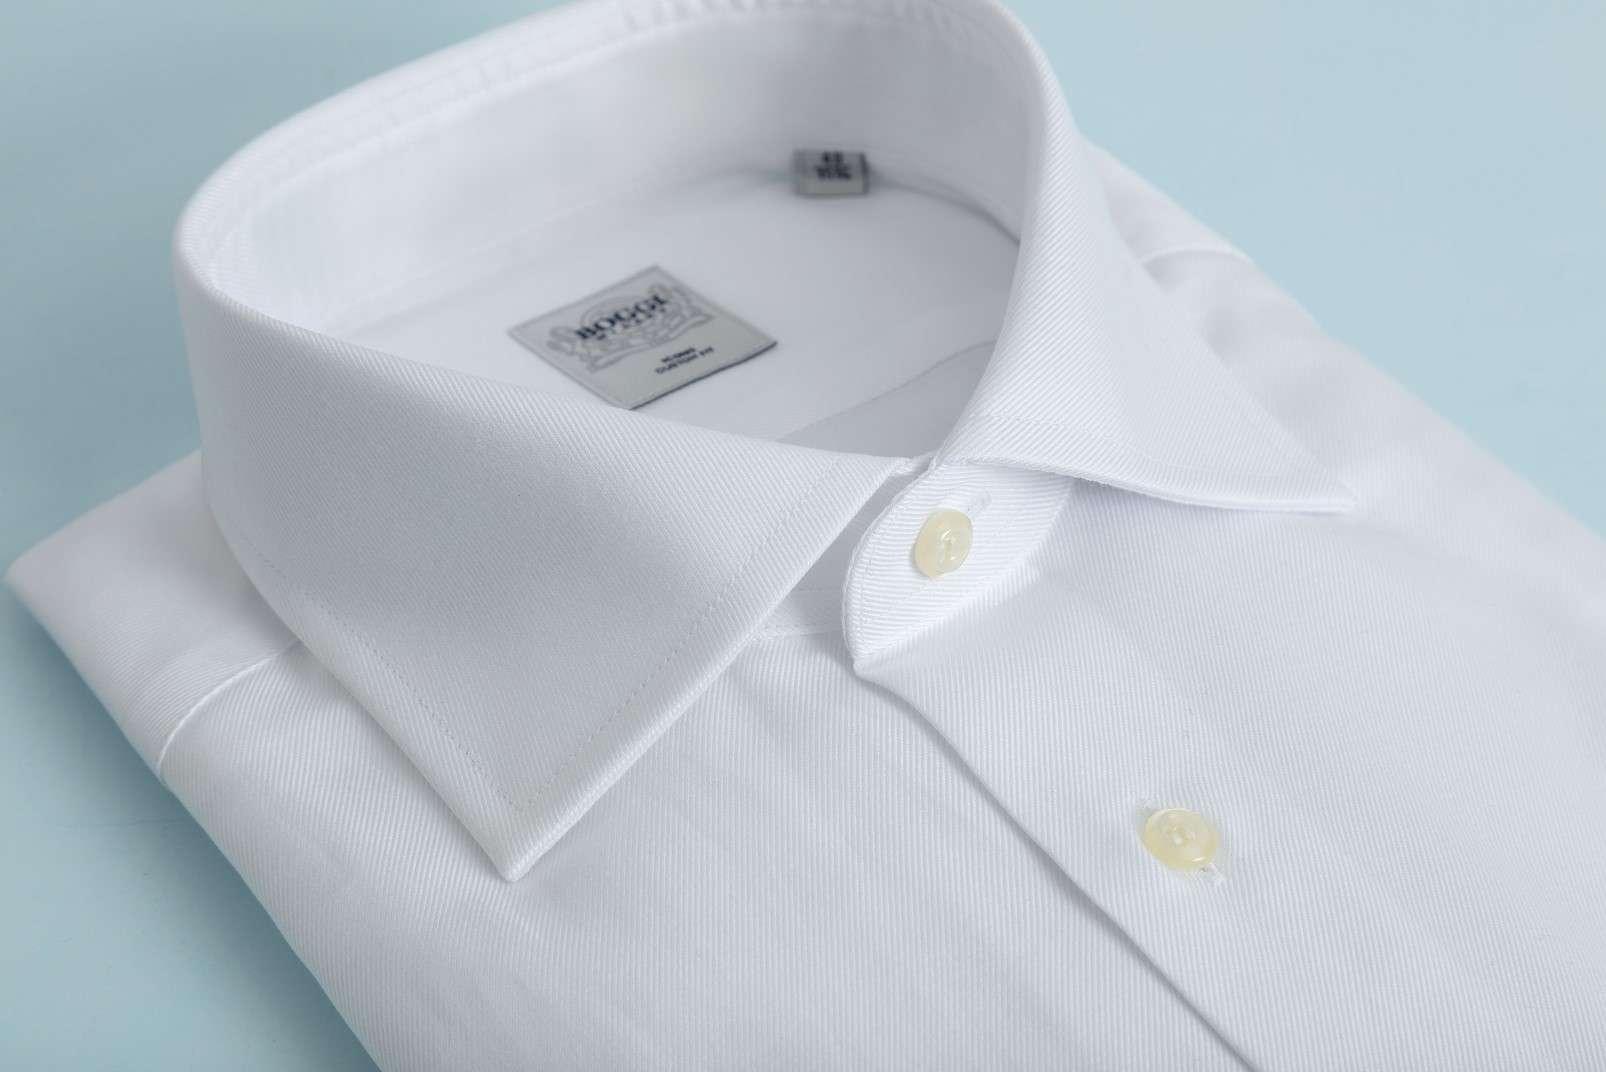 Boggi Milano shirt - Windsor collar